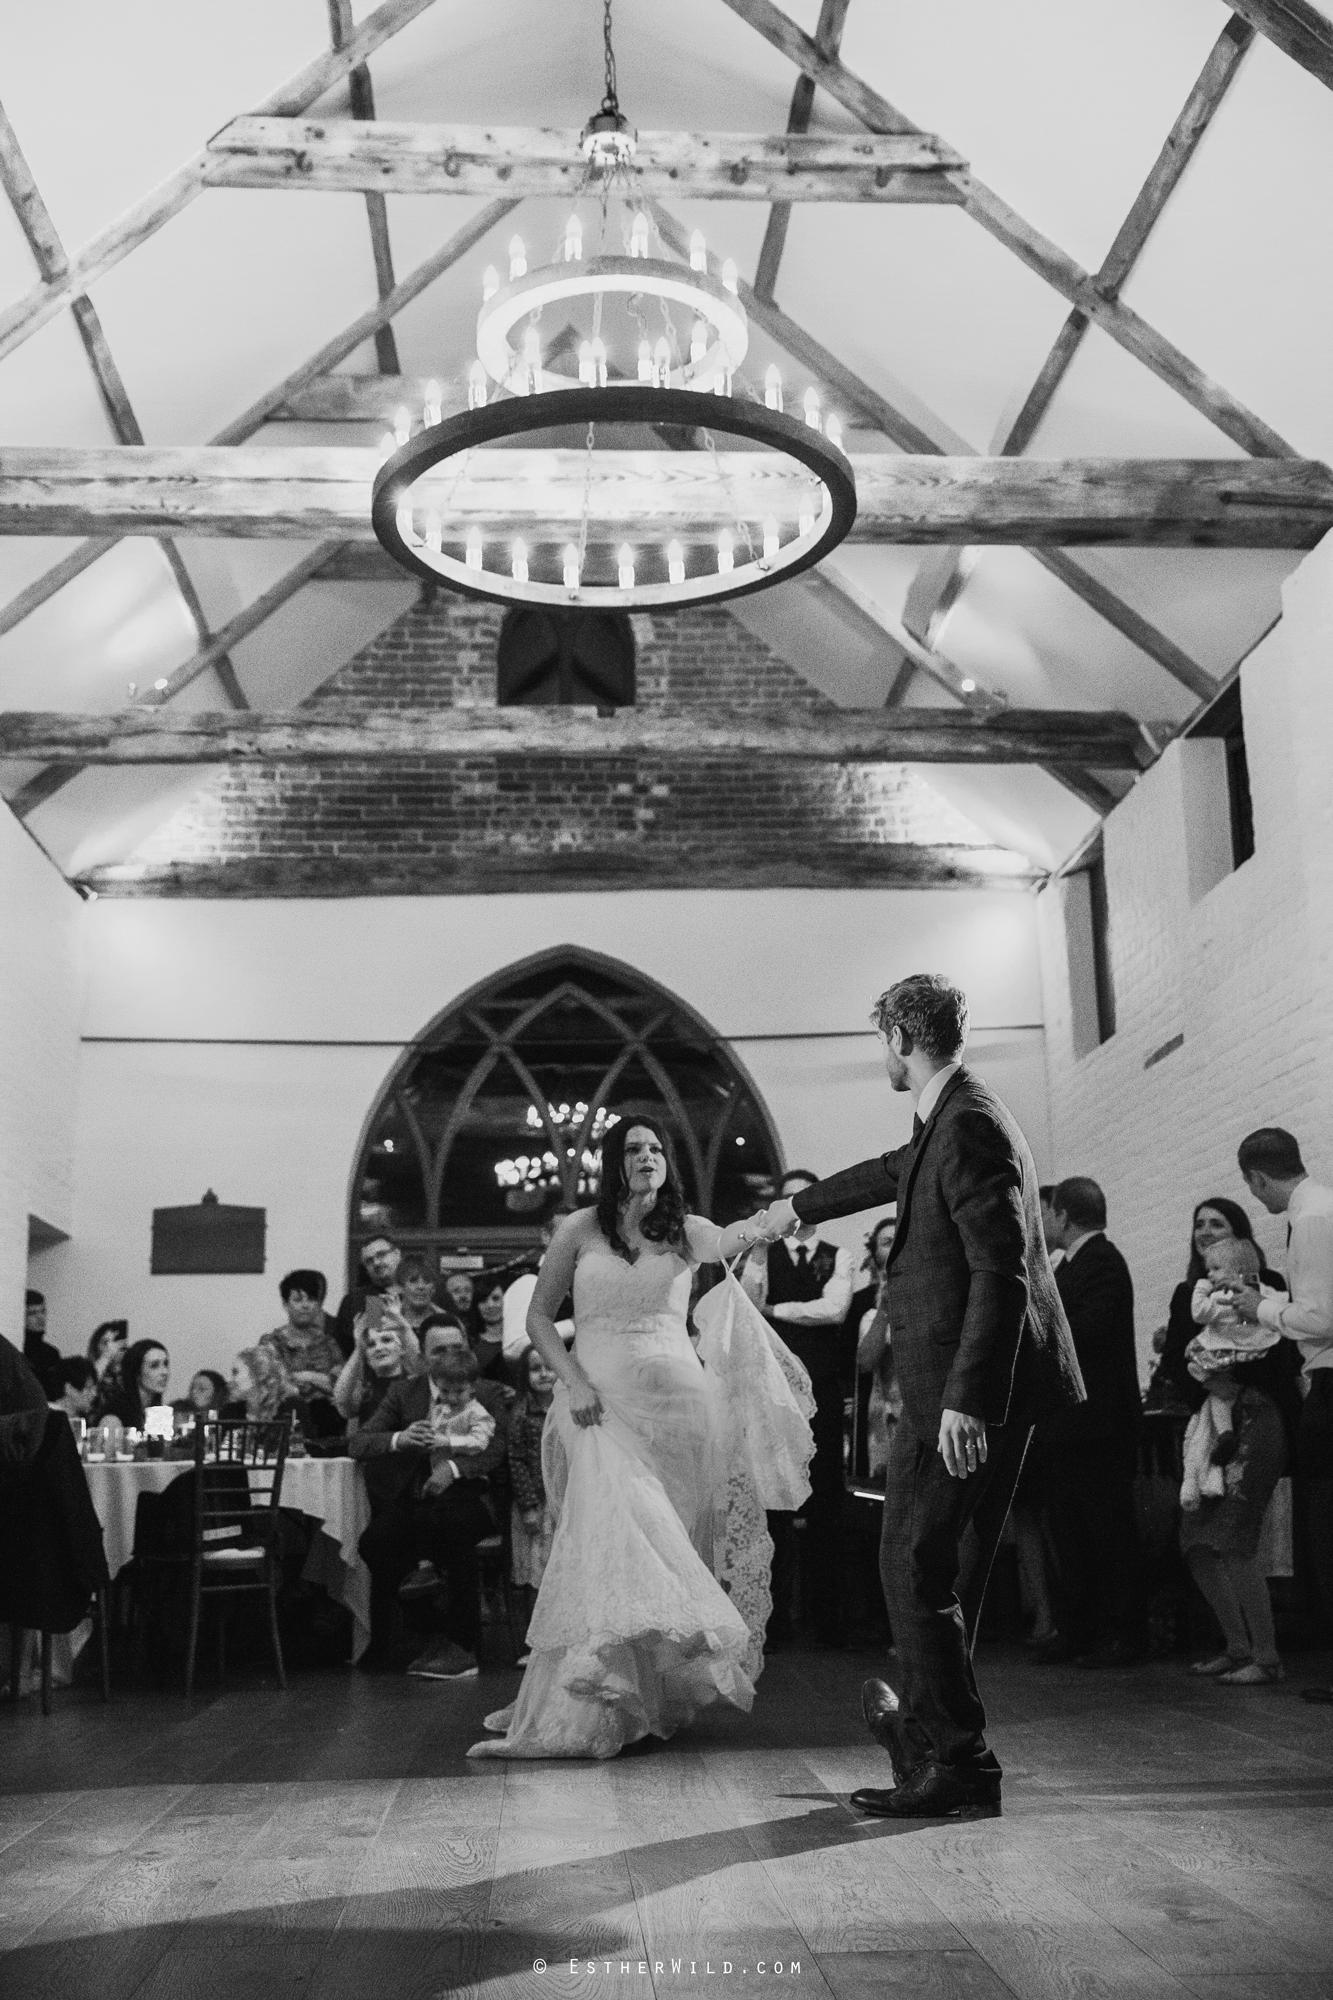 Reading_Room_Weddings_Alby_Norwich_Photographer_Esther_Wild_IMG_3398-1.jpg